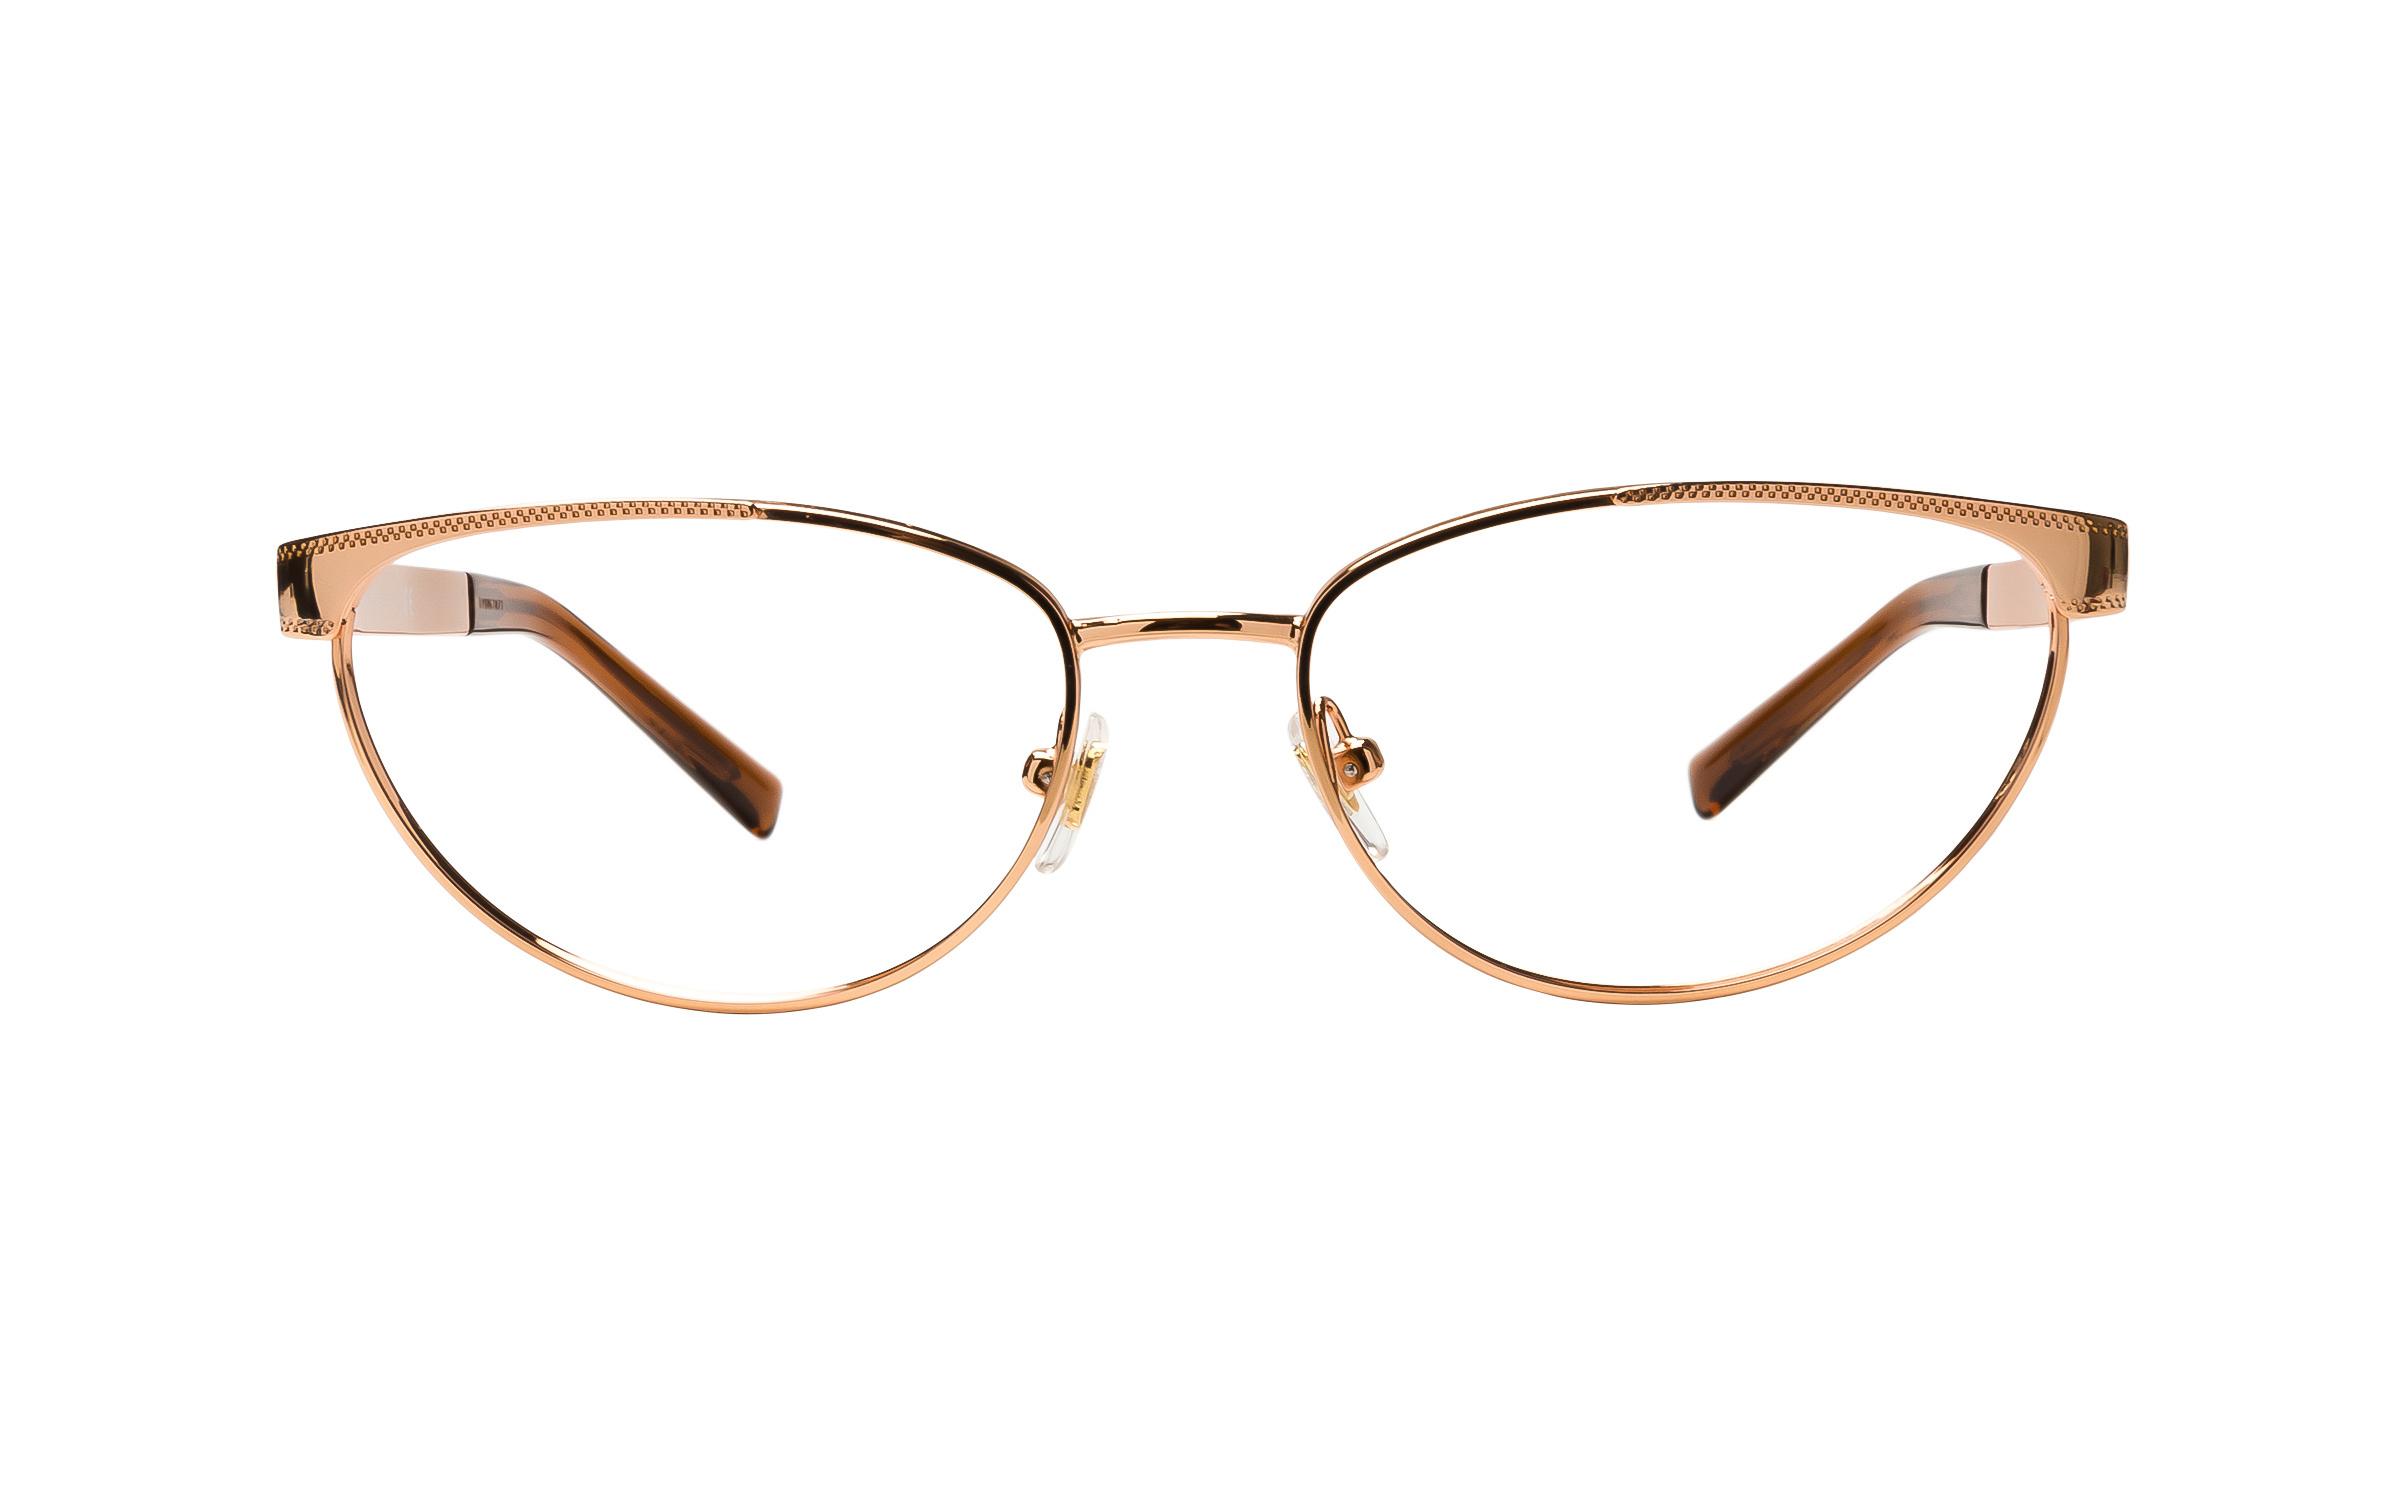 Versace VE1260 1412 (52) Eyeglasses and Frame in Rose Gold/Pink | Plastic/Metal - Online Coastal